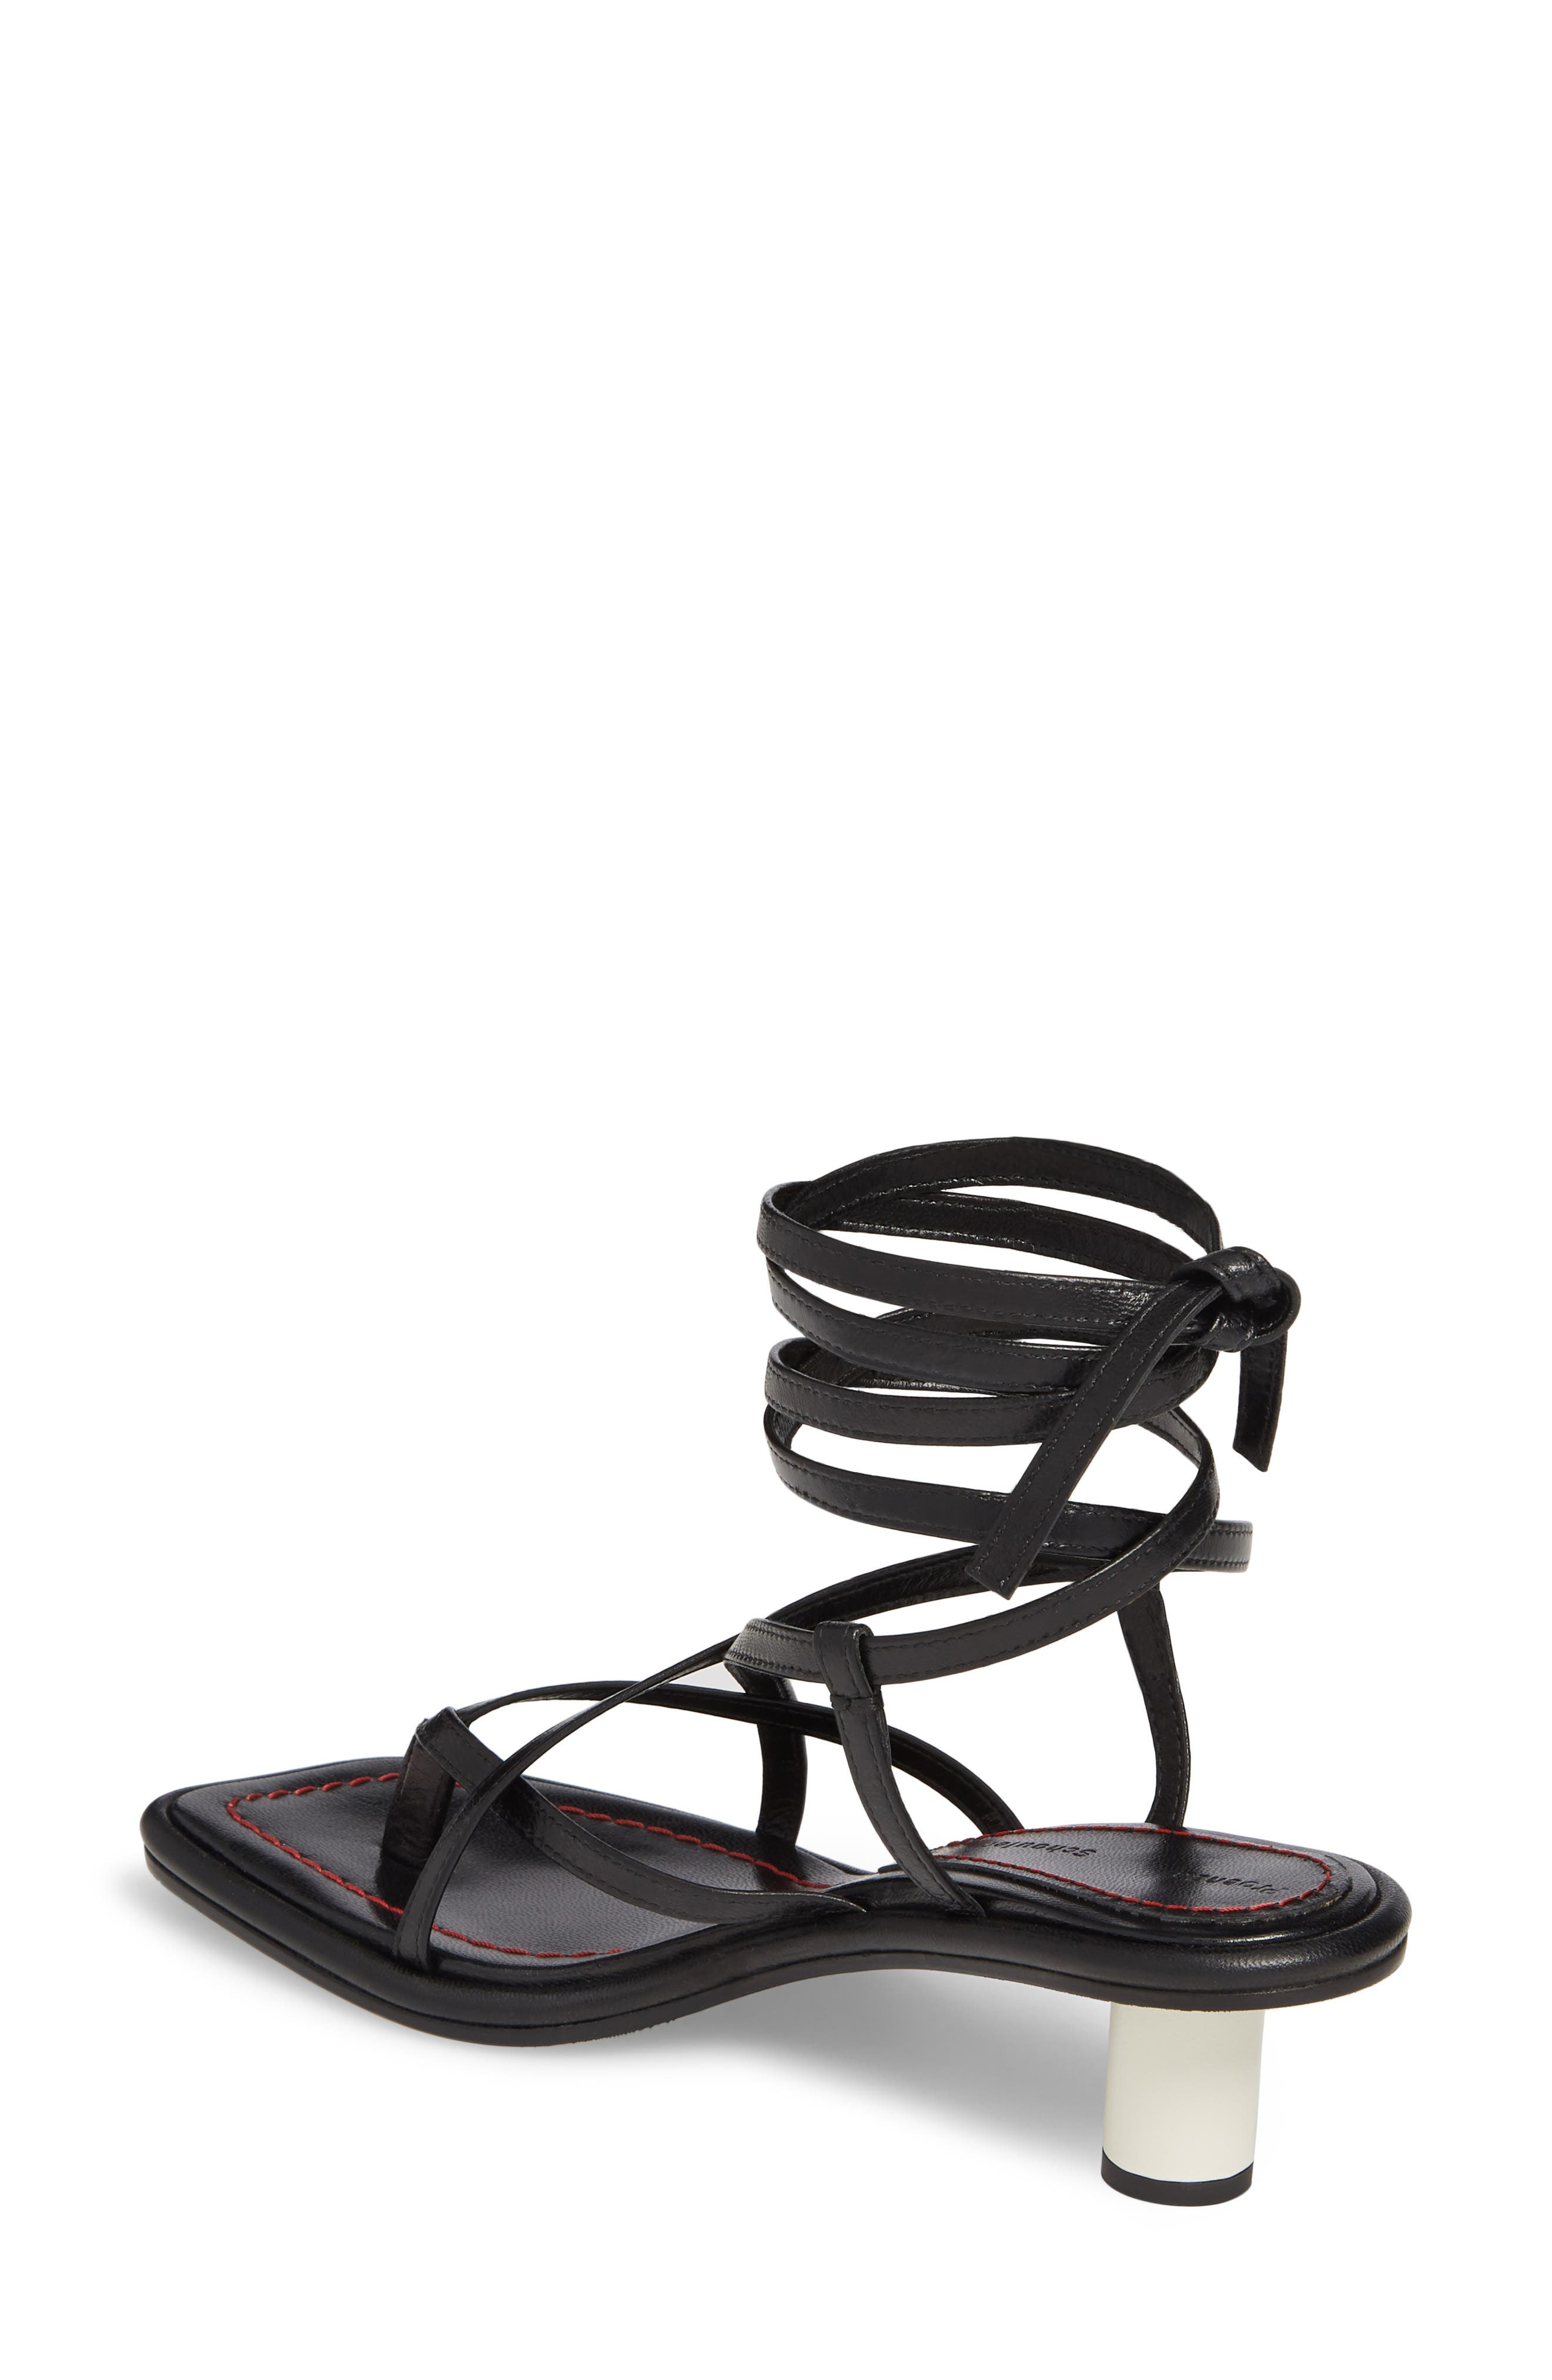 Wraparound Ankle Strap Sandal,                             Alternate thumbnail 2, color,                             BLACK